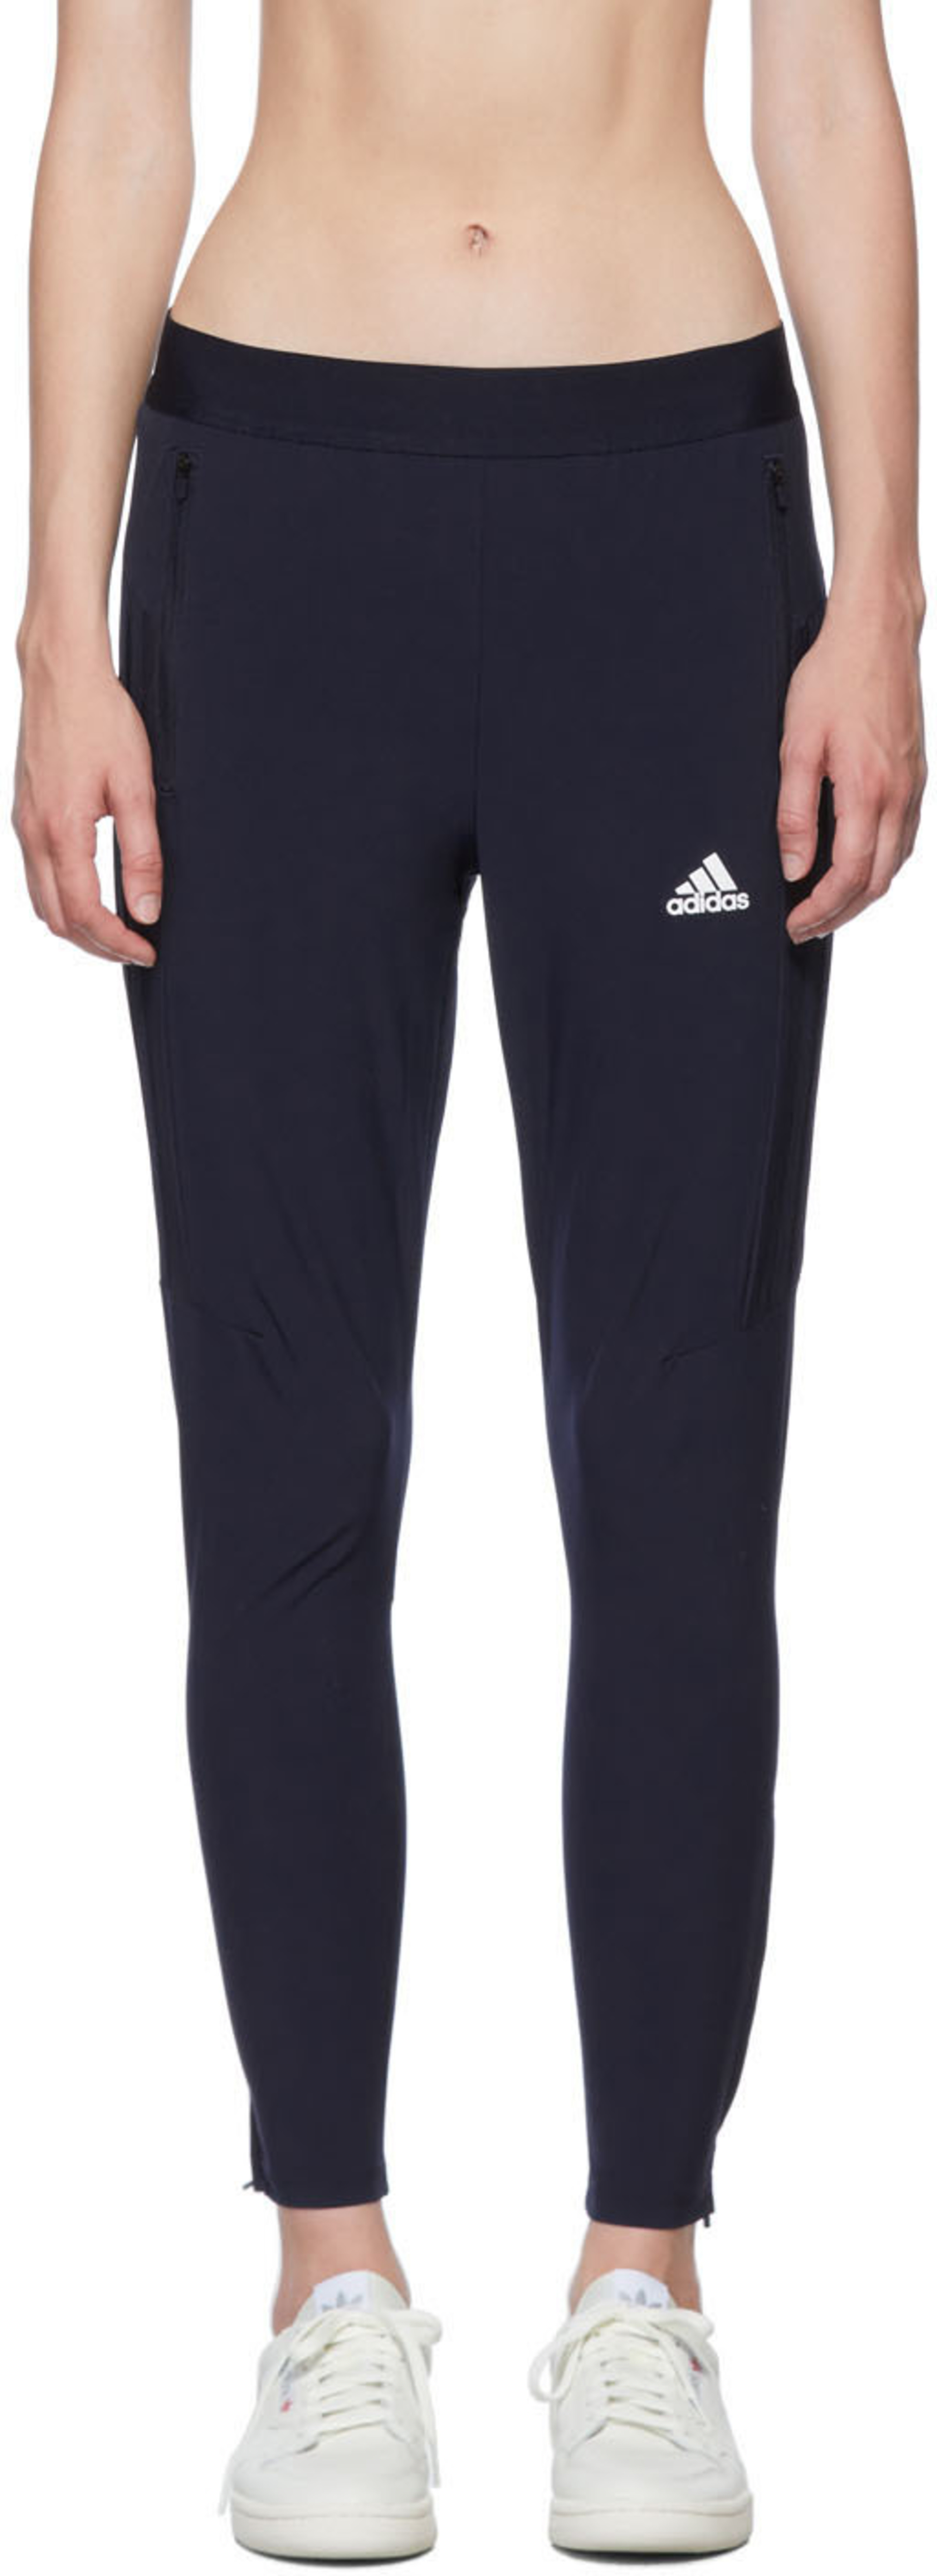 Navy 3 Stripes Training Pants